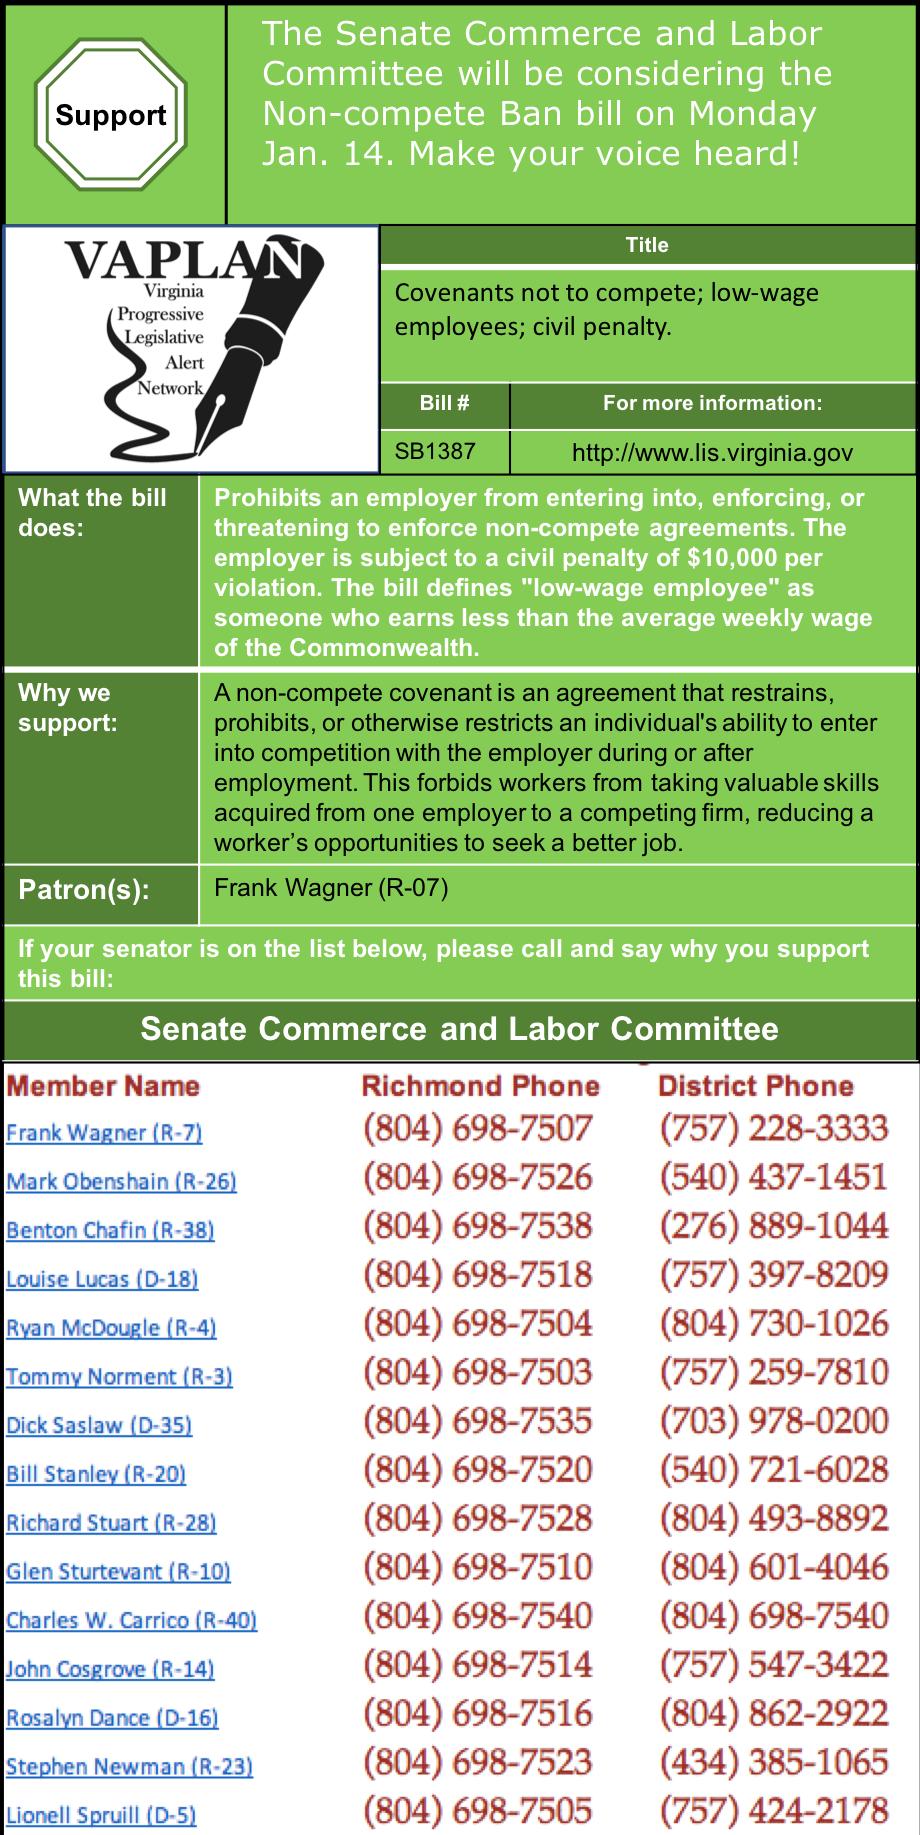 ALERT: Support Ending Non-Compete Covenants in Senate Commerce & Labor